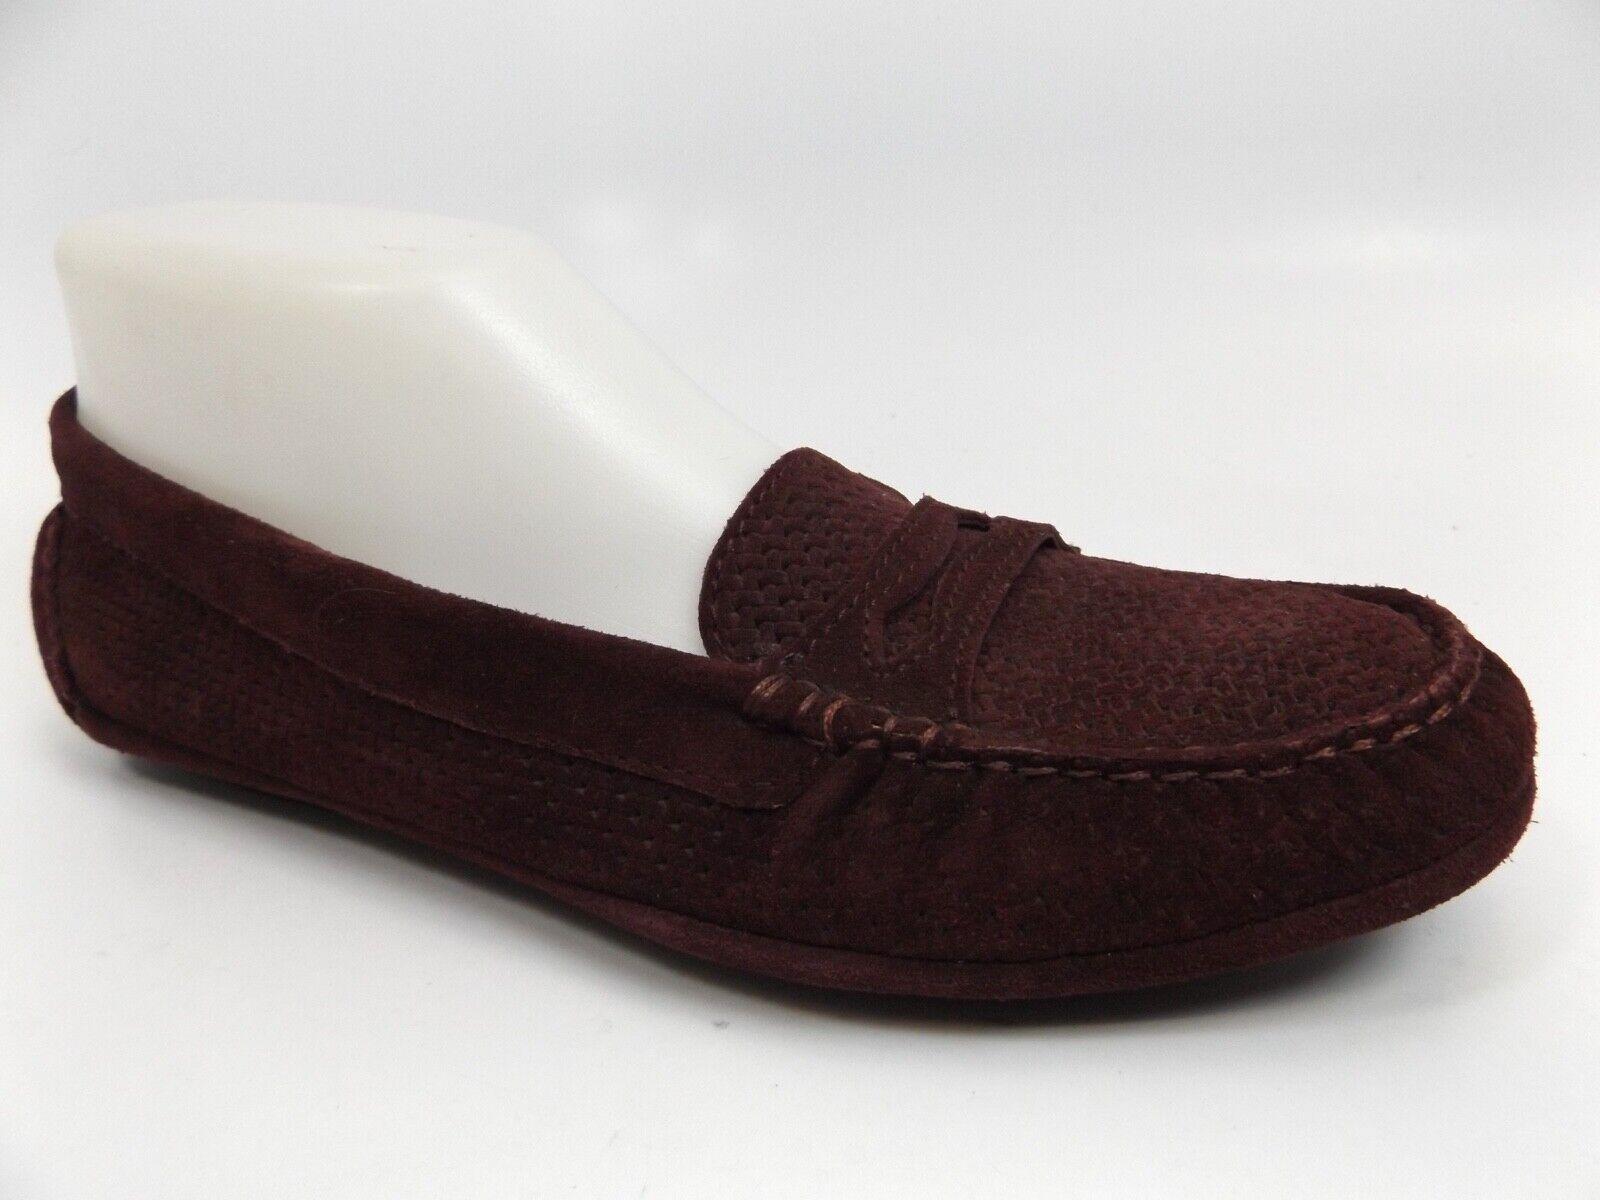 Aquatalia Sawyer Pennyloafer Wildleder Damen Schuhe Sz 7.0 M,Weinrot Neu,D11841